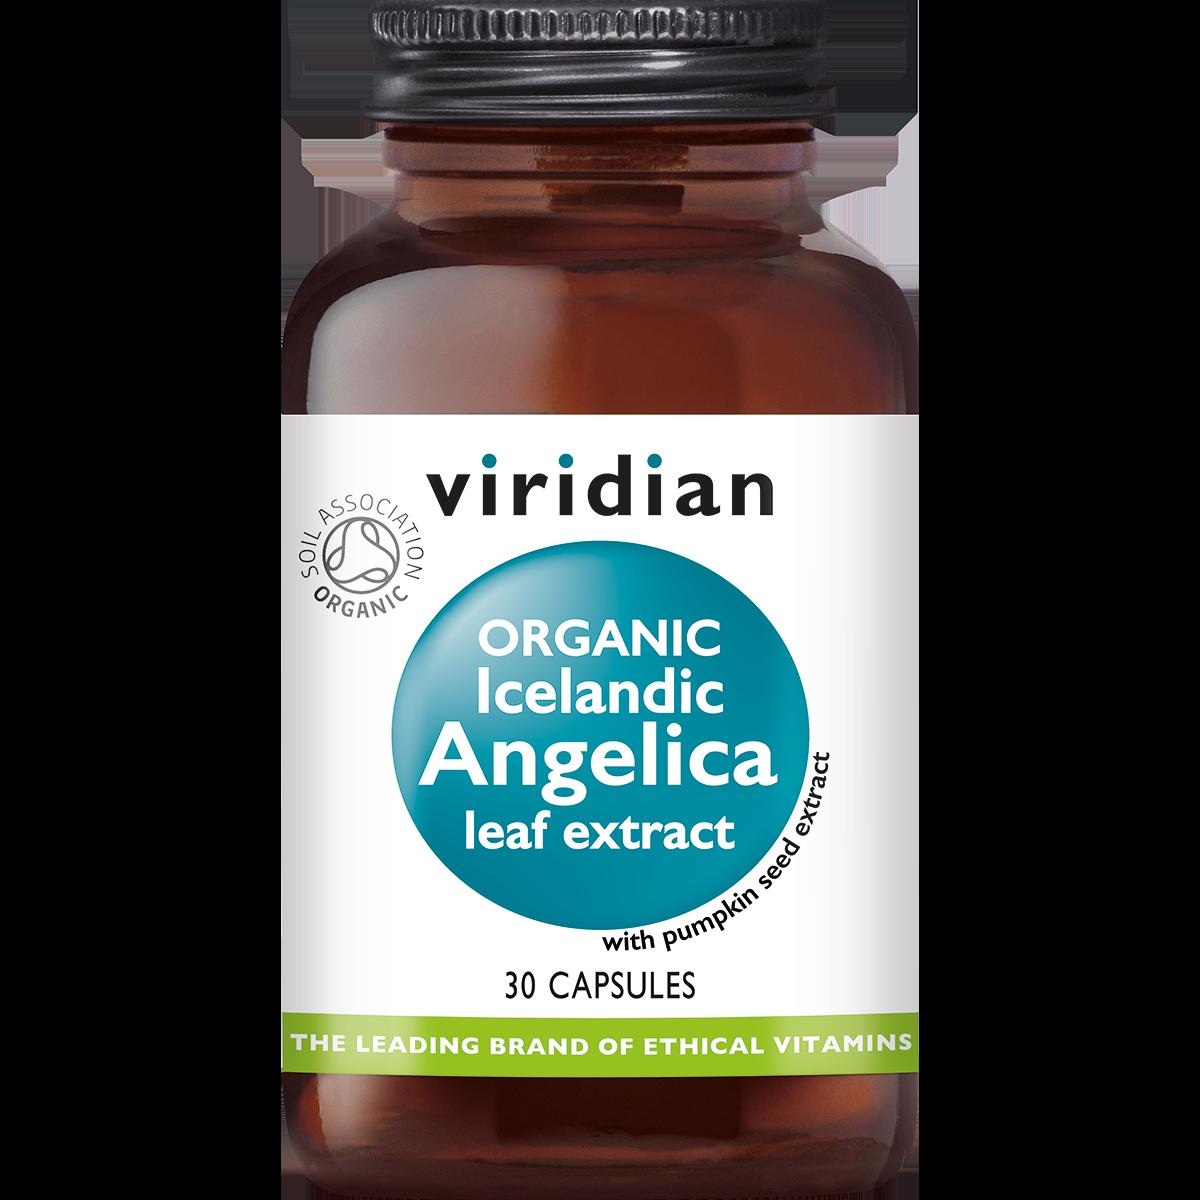 Organic Icelandic Angelica Leaf Extract